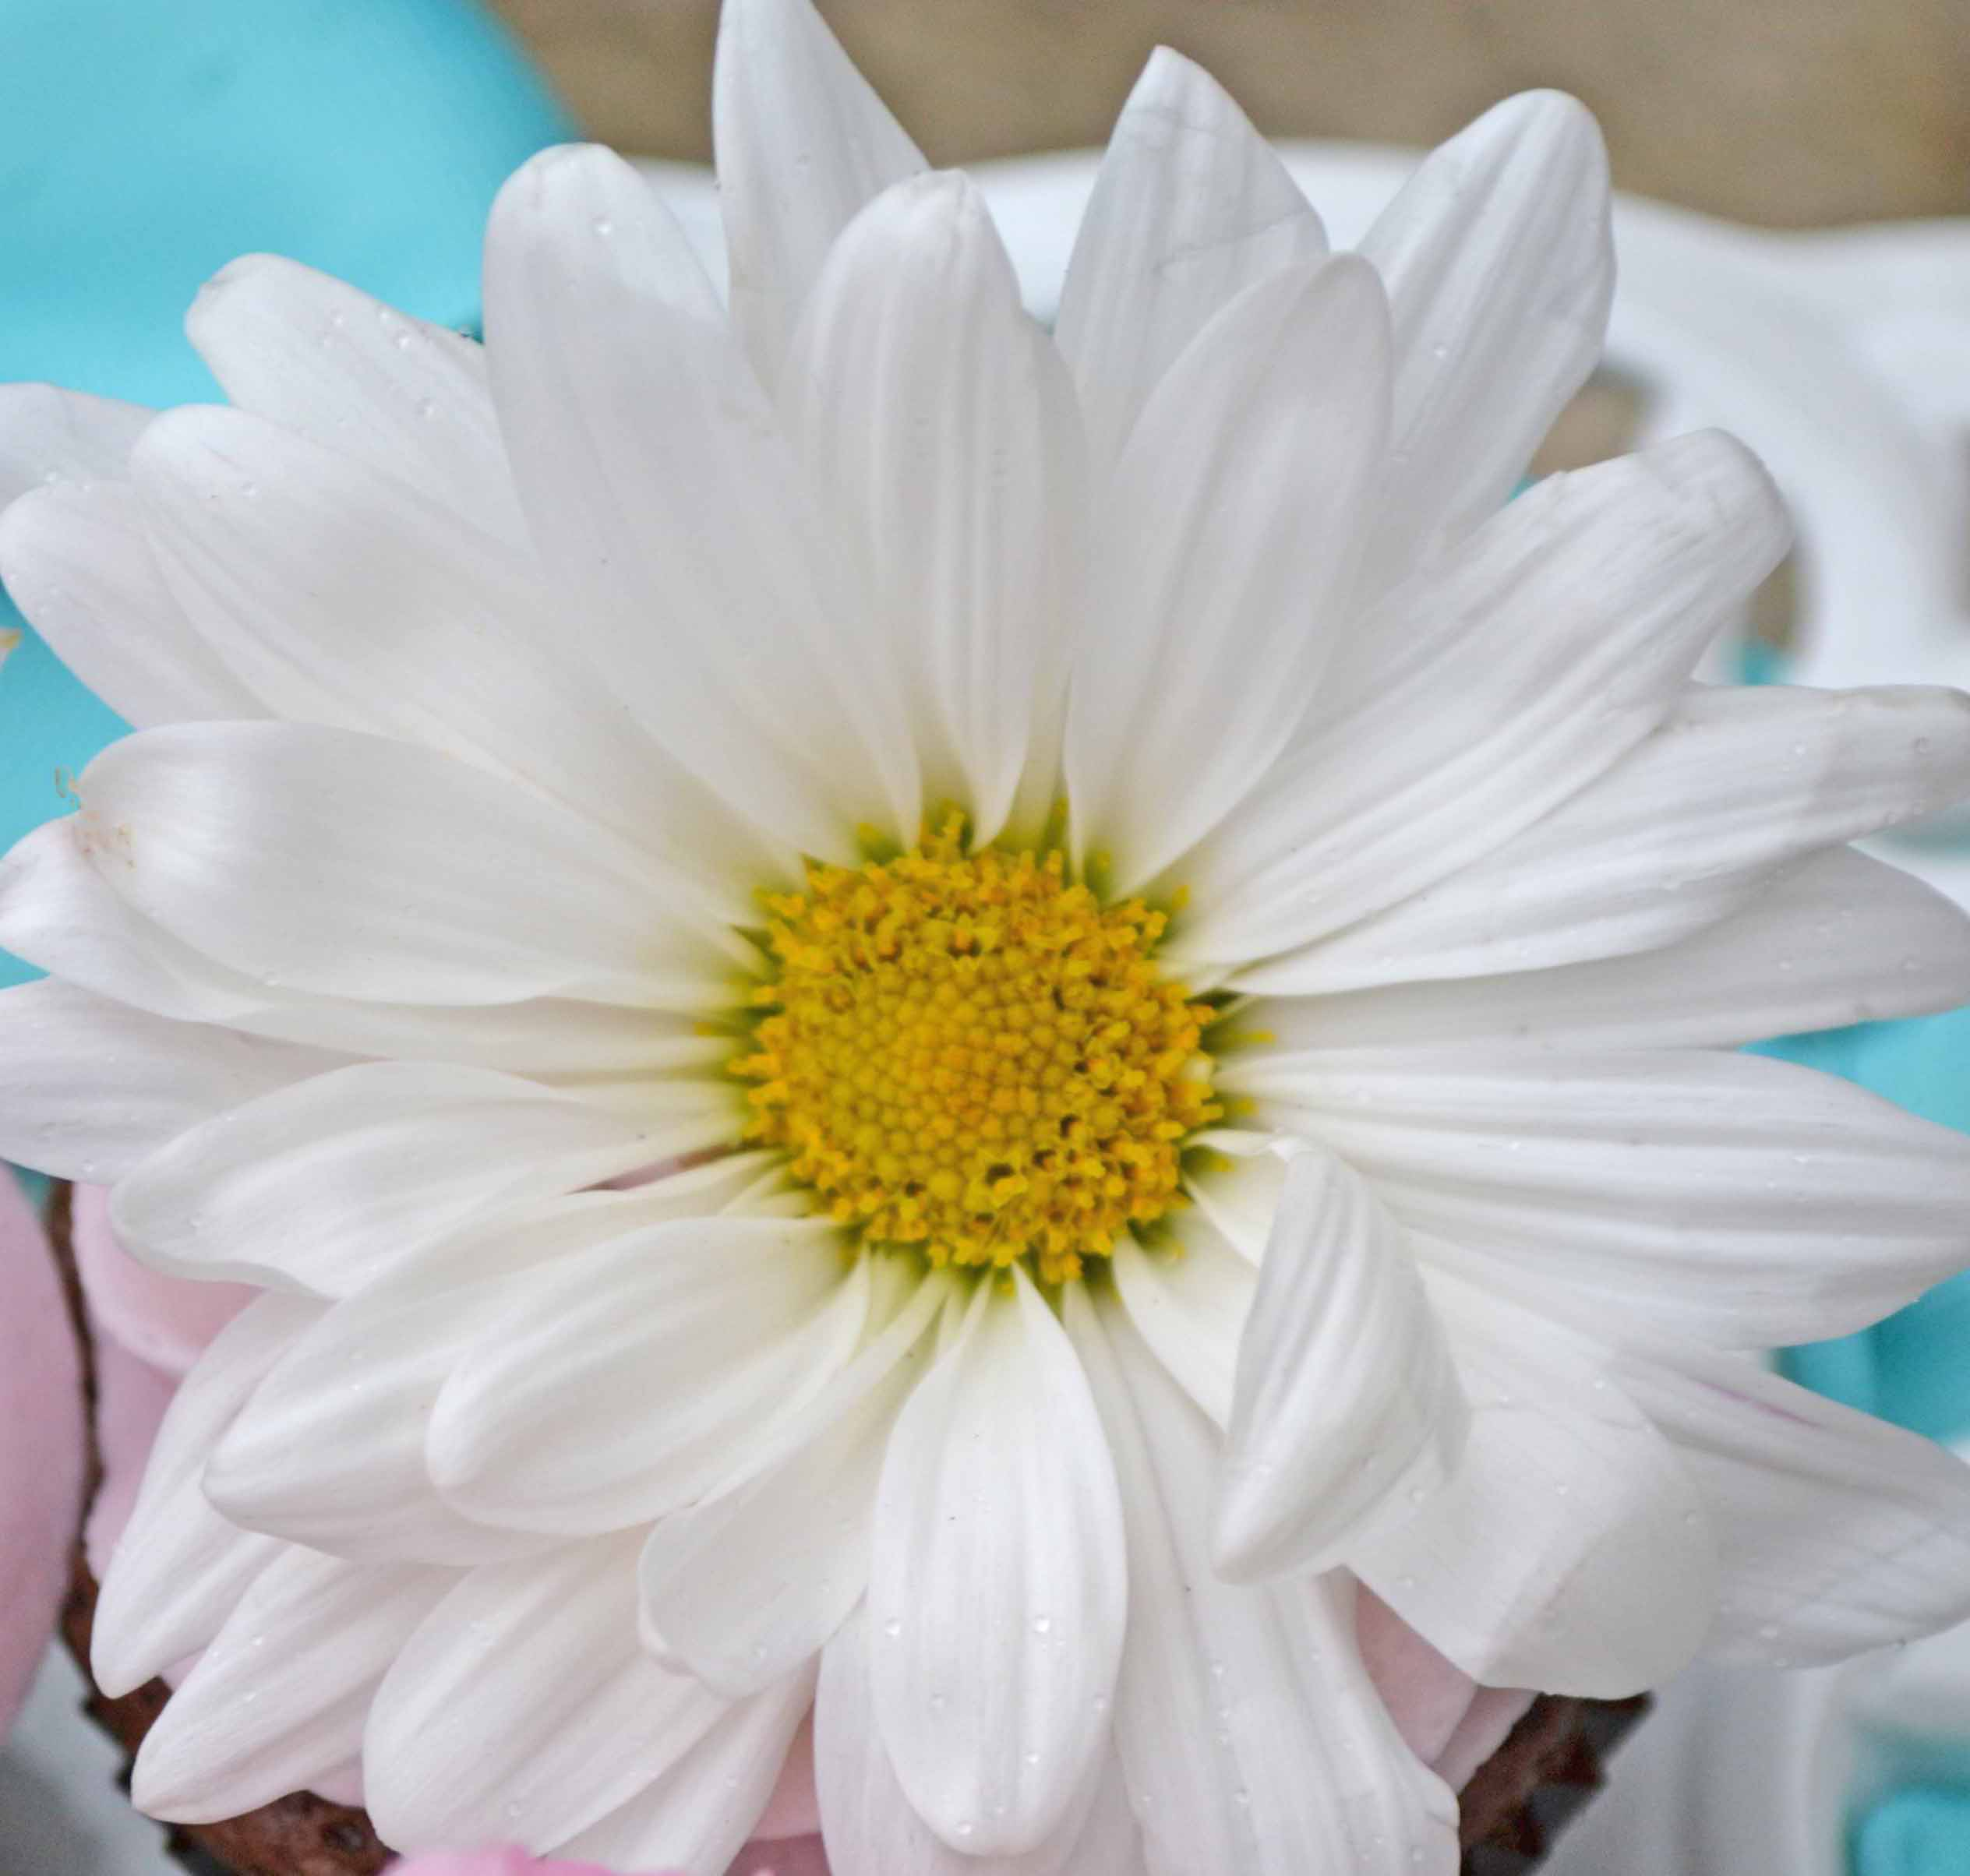 Sweetdesigncompany treats sweet design company edible flowers mightylinksfo